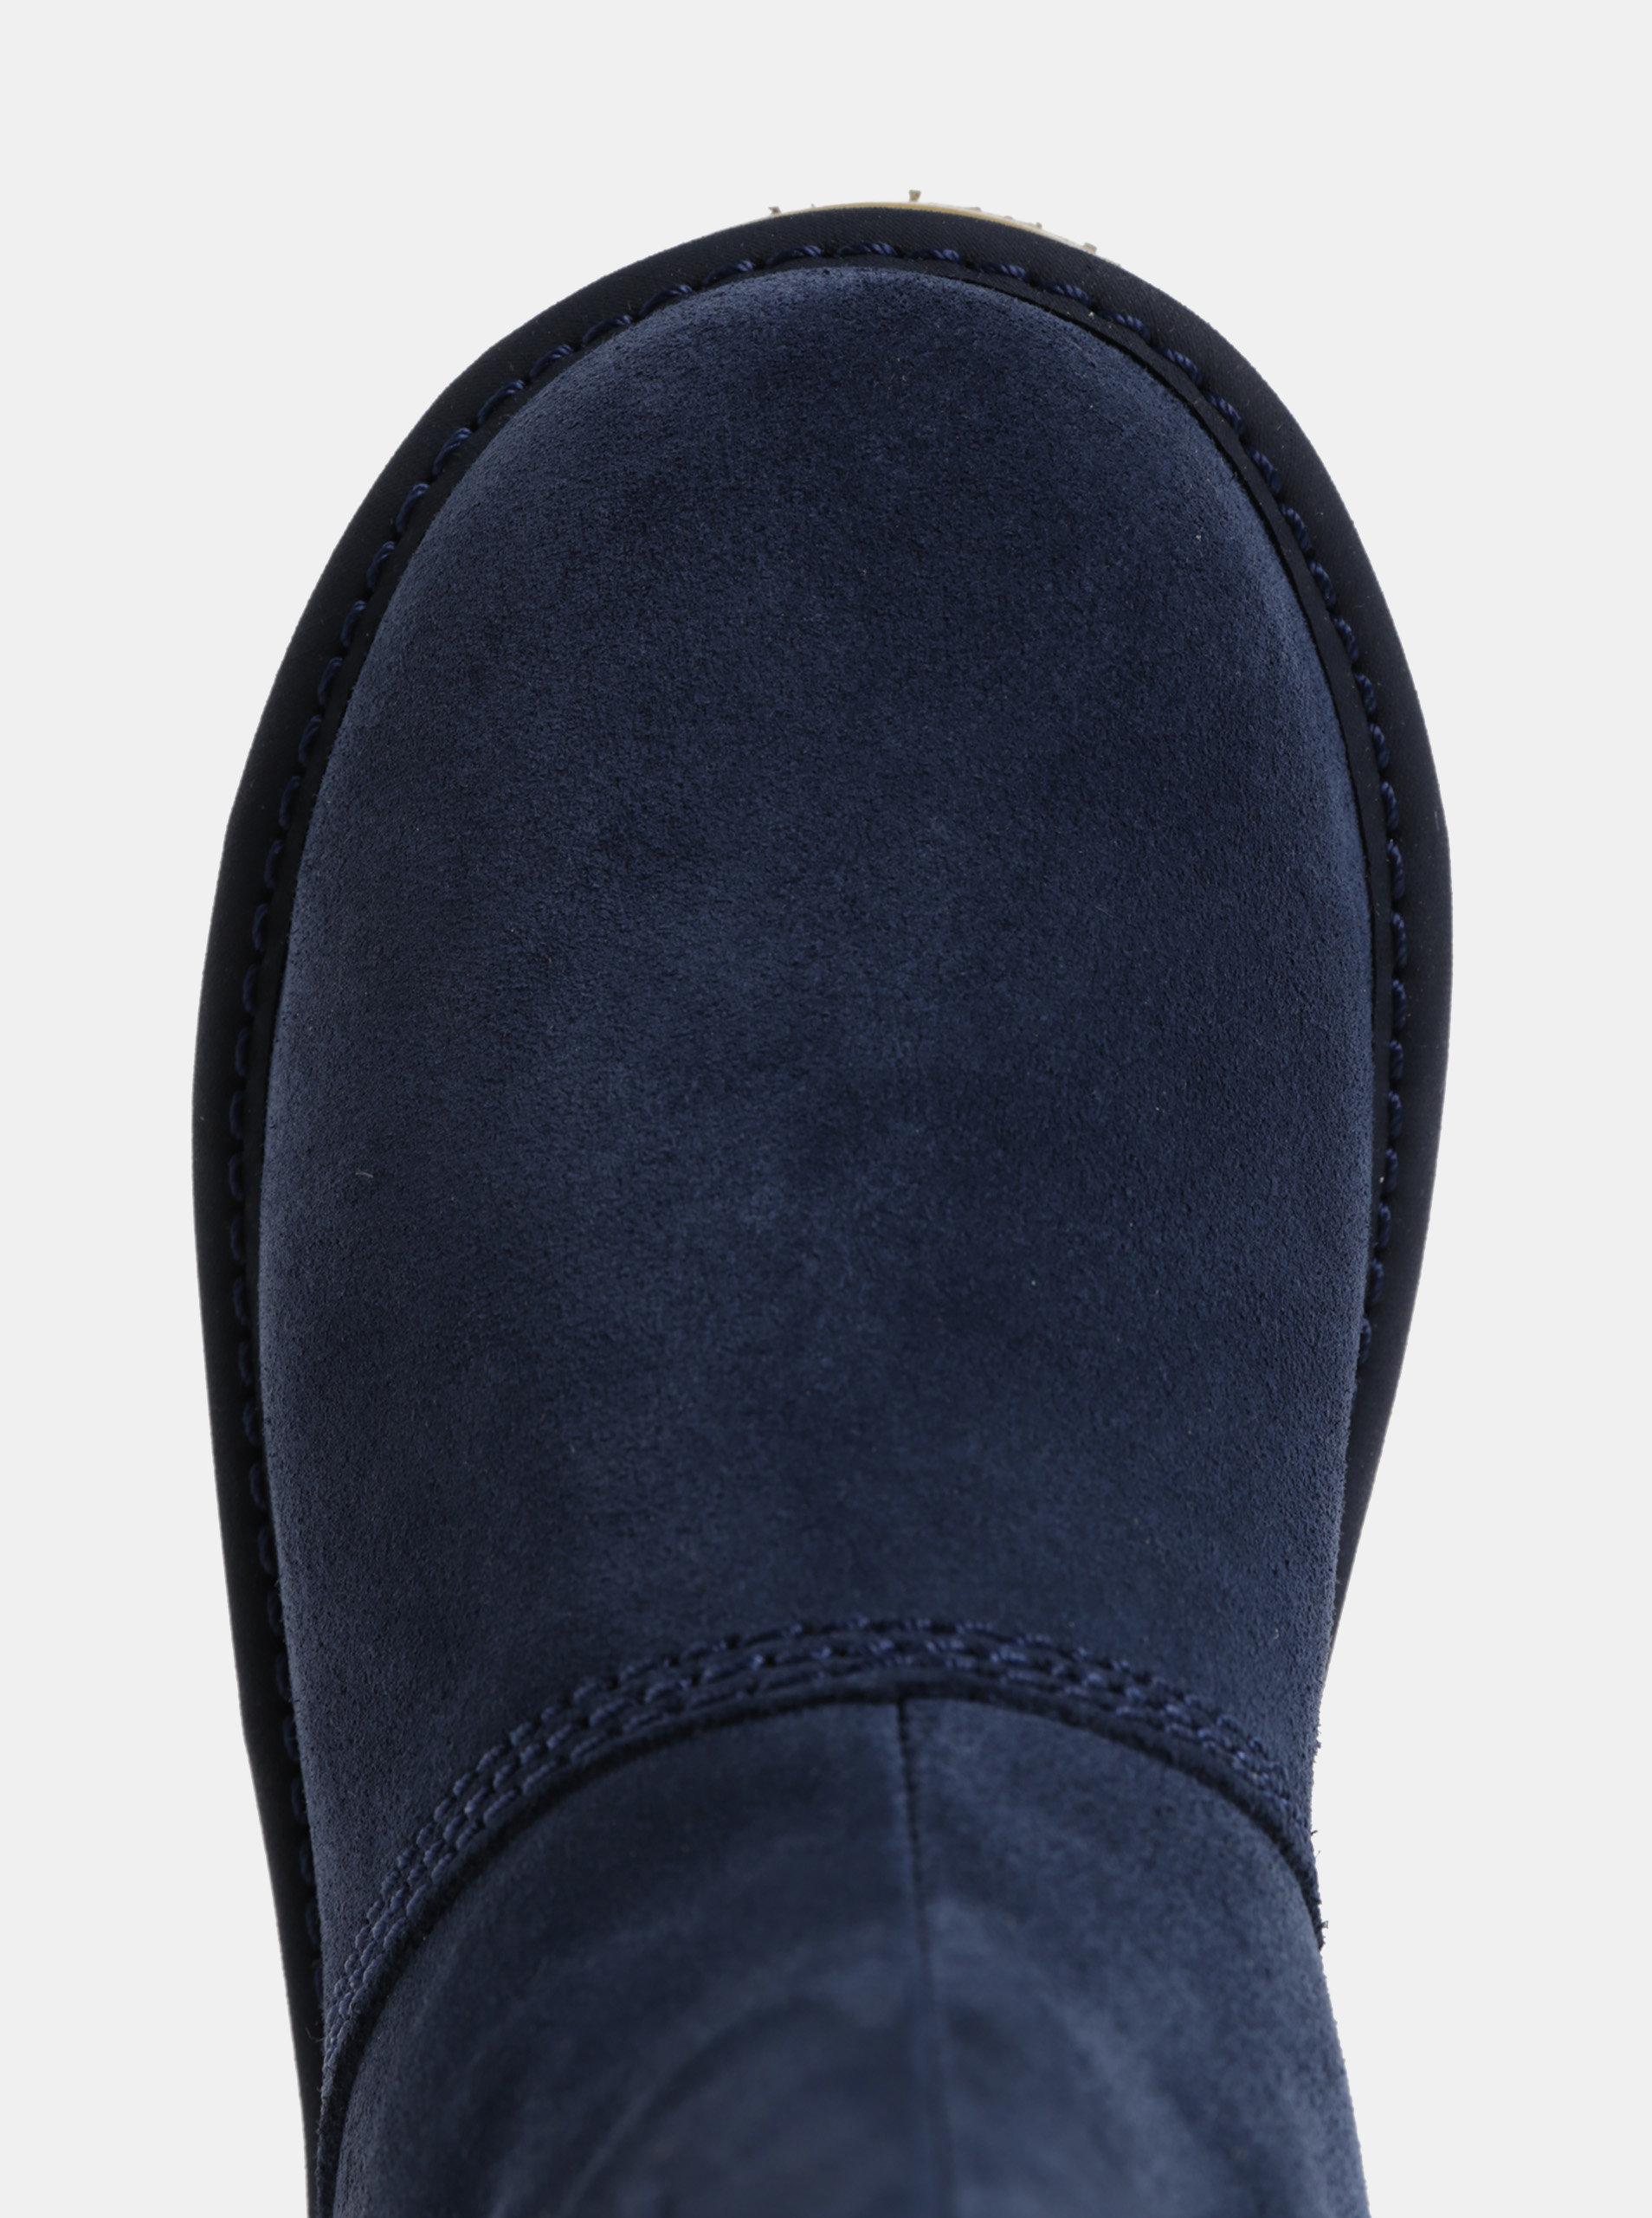 3d0537077ec4 Tmavomodré dámske semišové zimné topánky SOREL Newbie ...